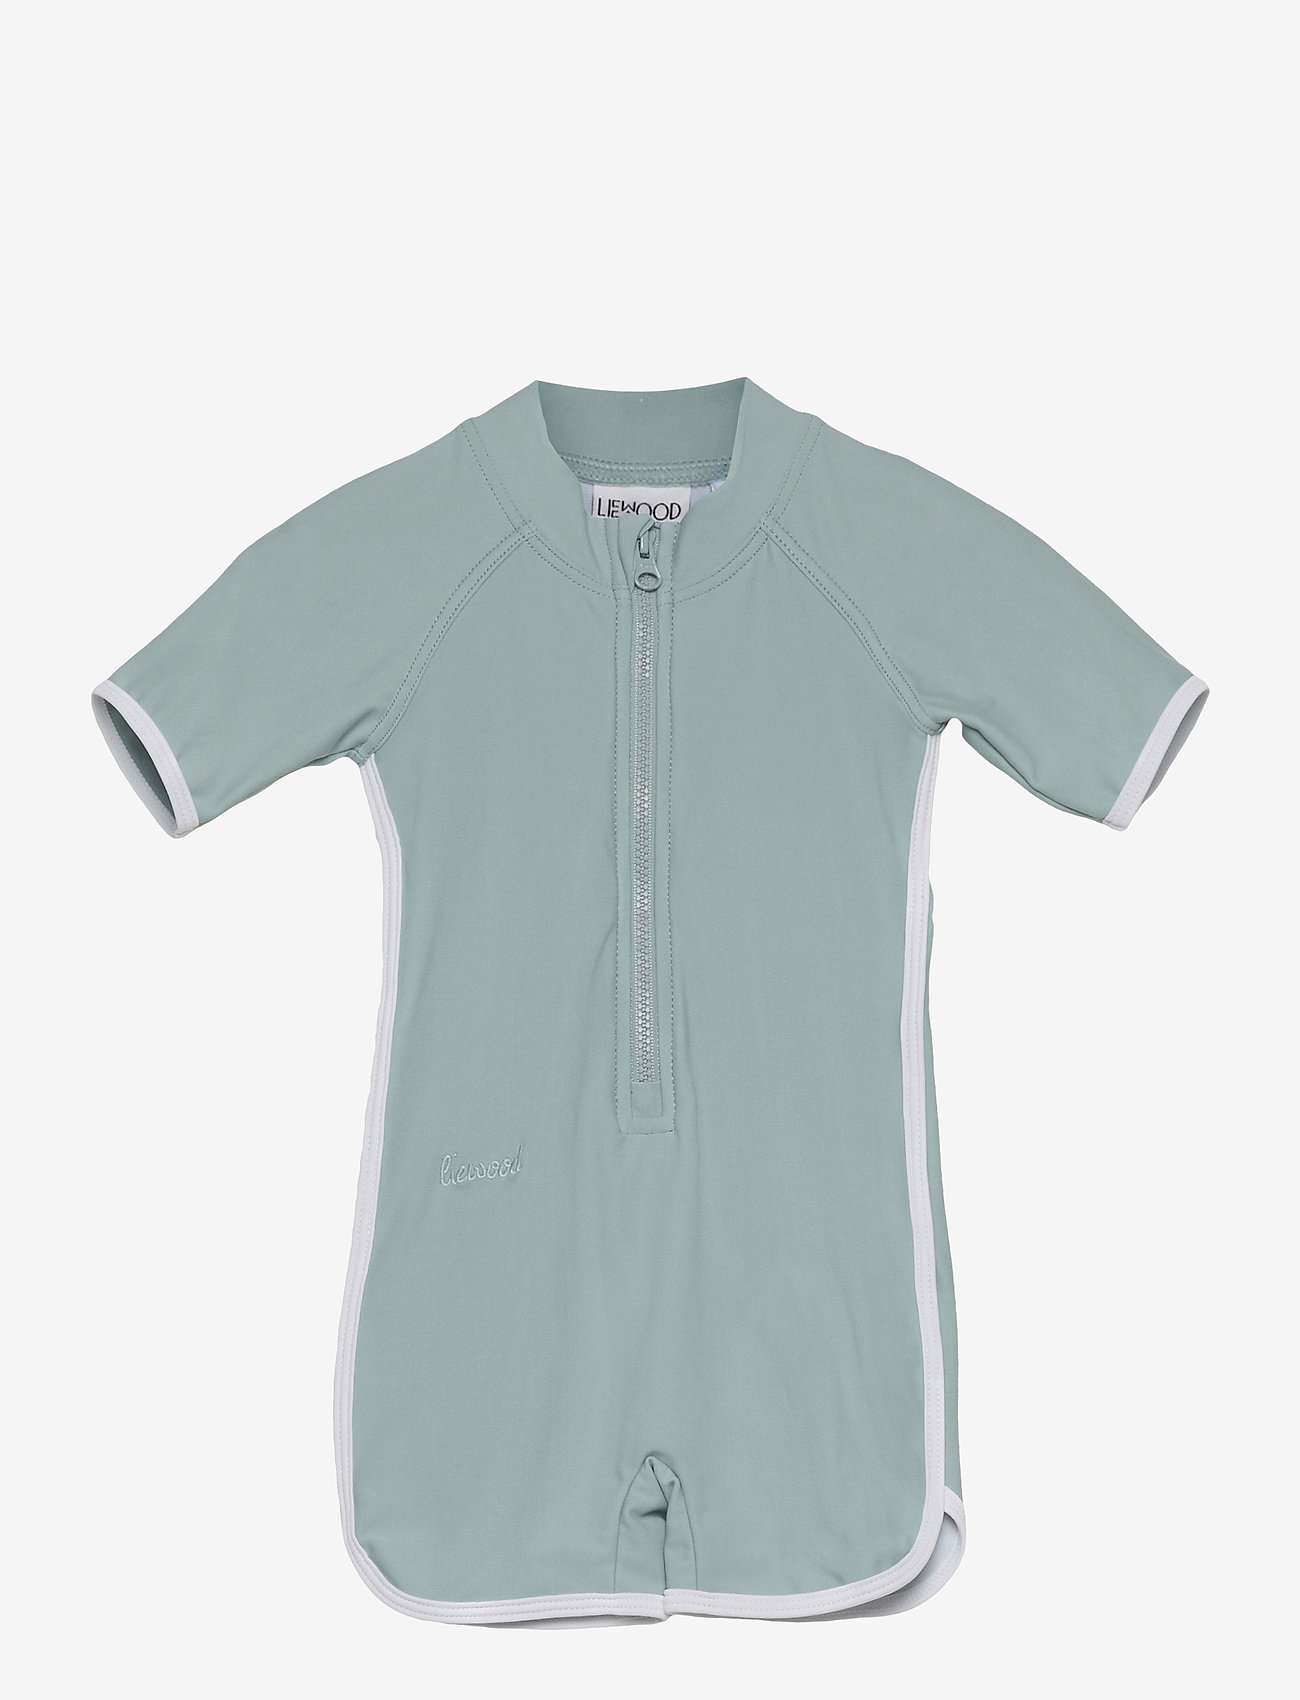 Liewood - Triton swim jumpsuit - swimsuits - sea blue - 0